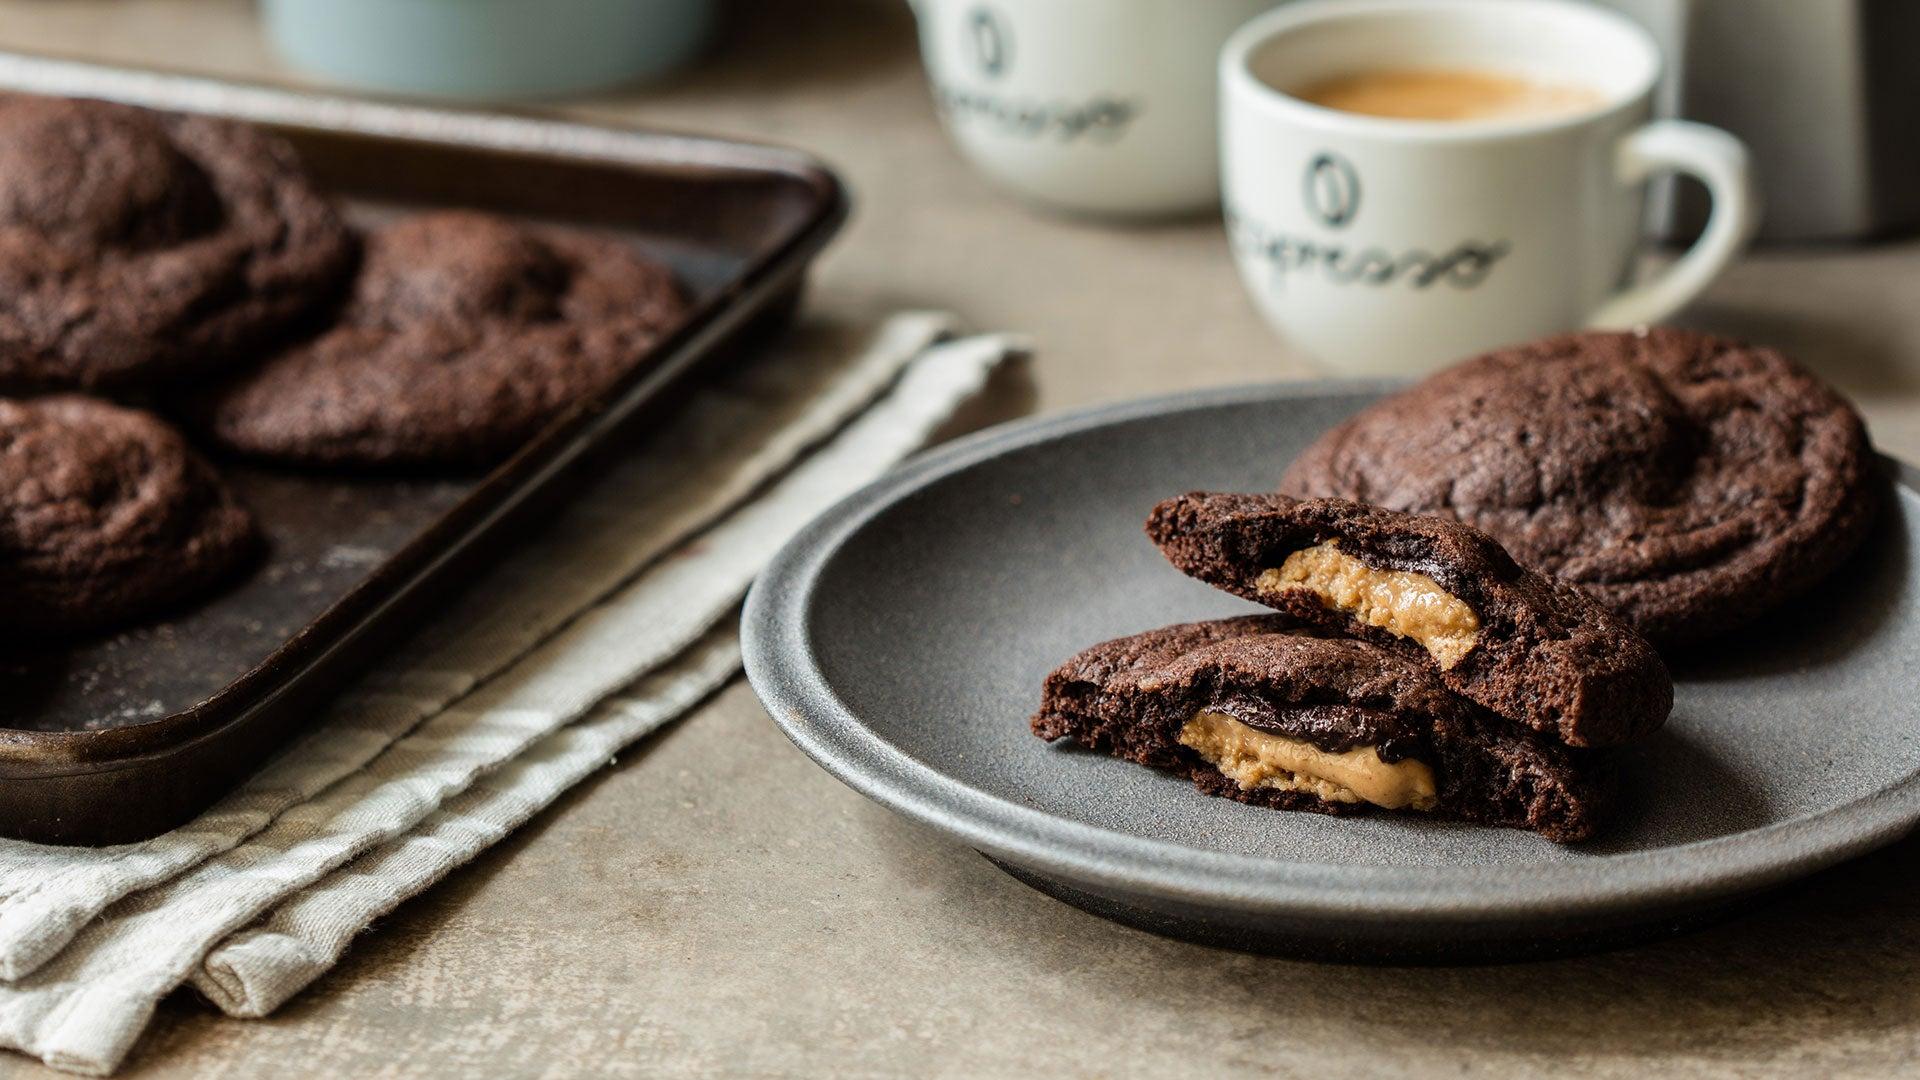 Chocolate & Peanut Butter Stuffed Cookies